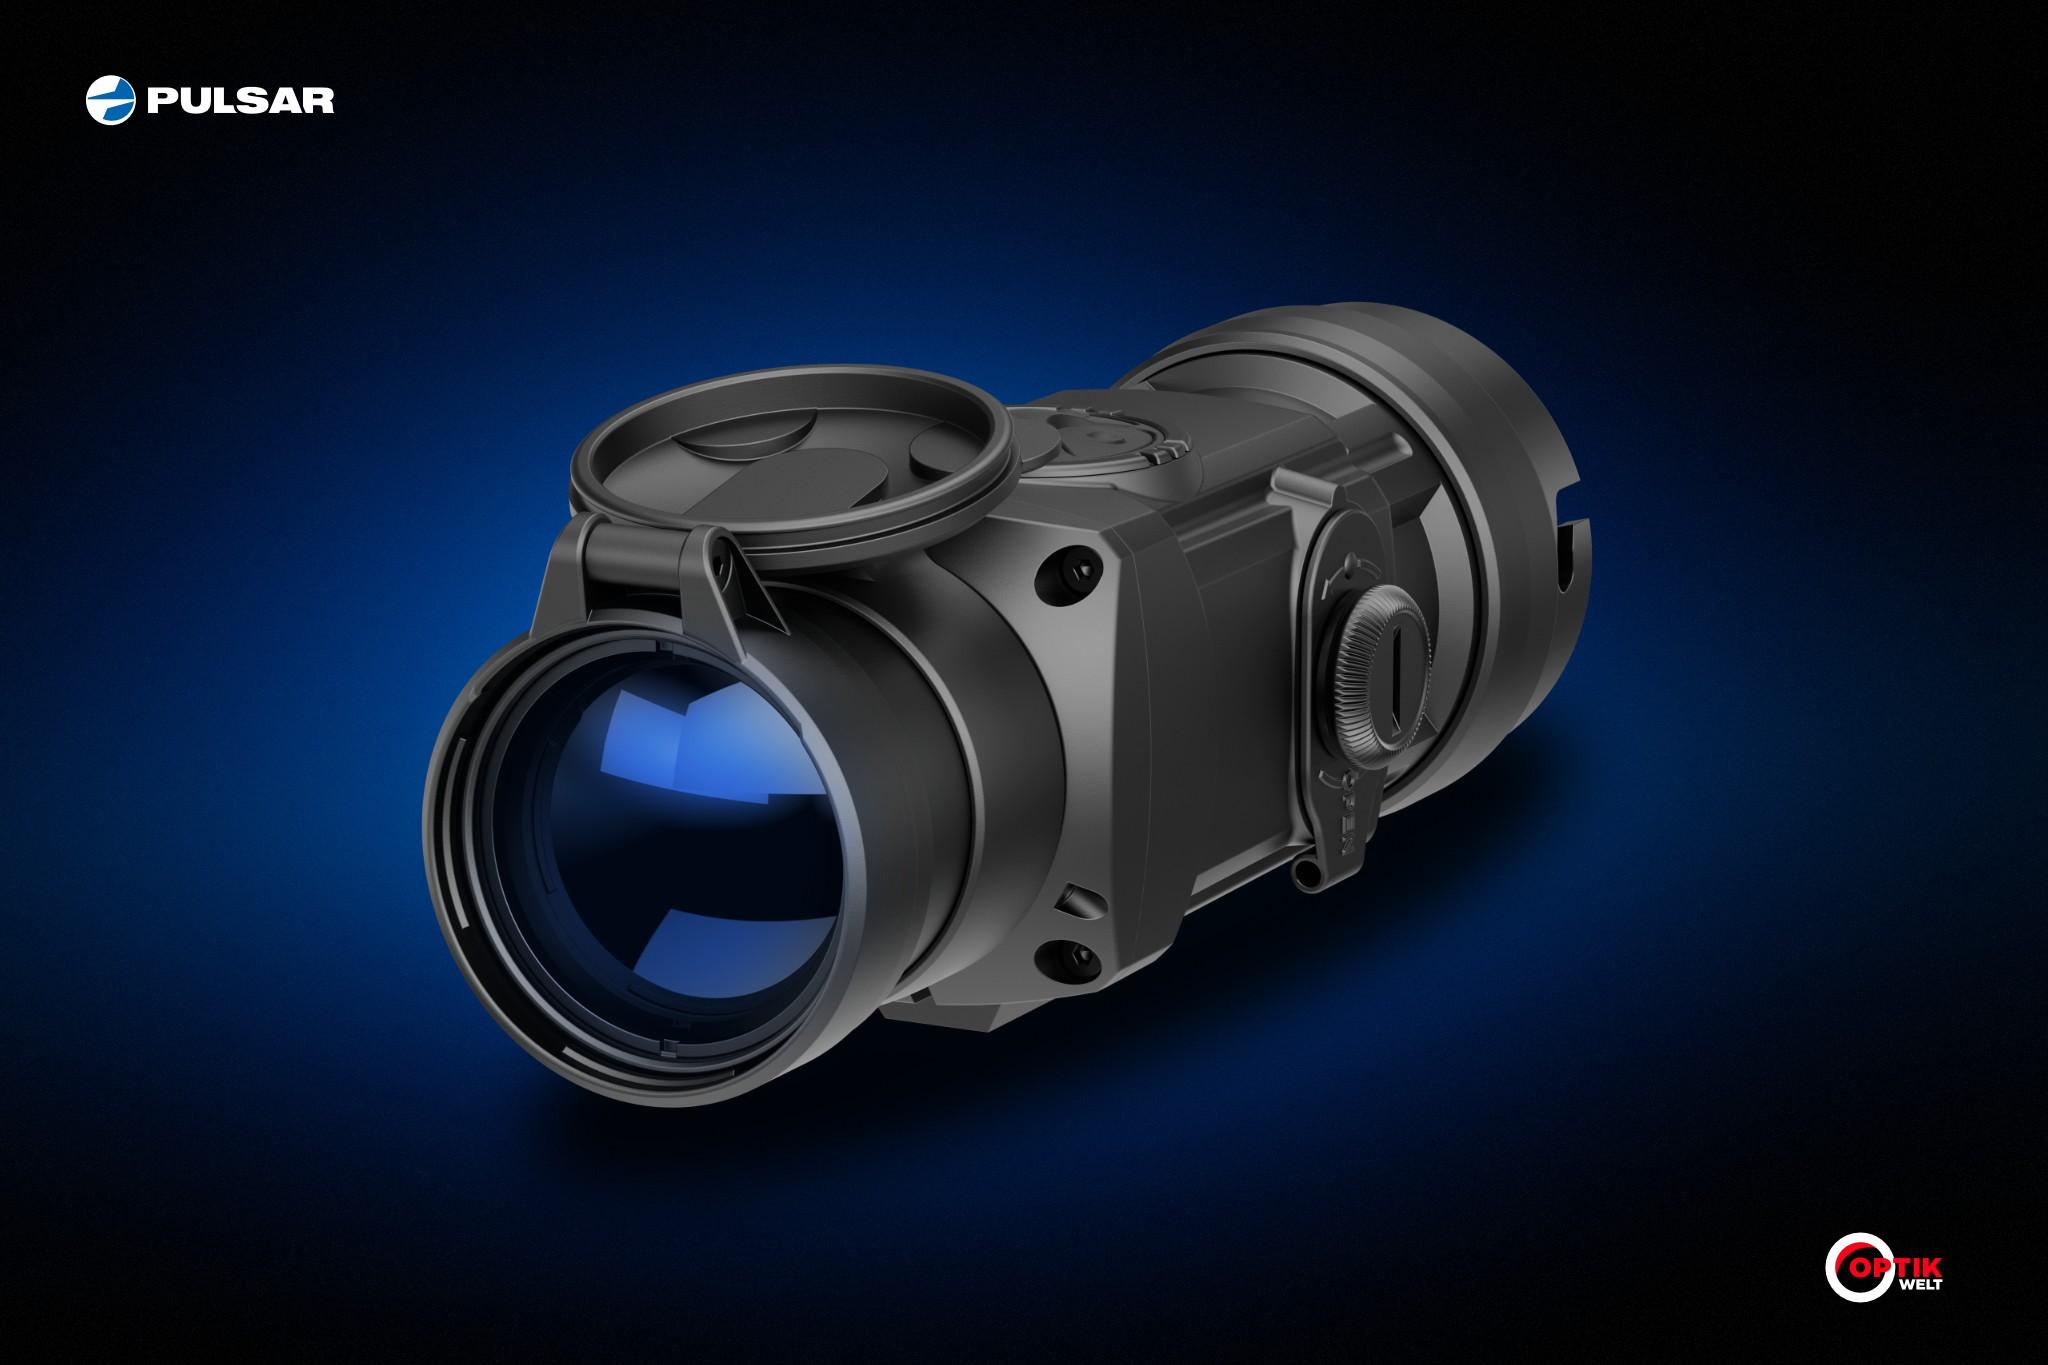 Termokaamera Pulsar Core FXQ55 BW